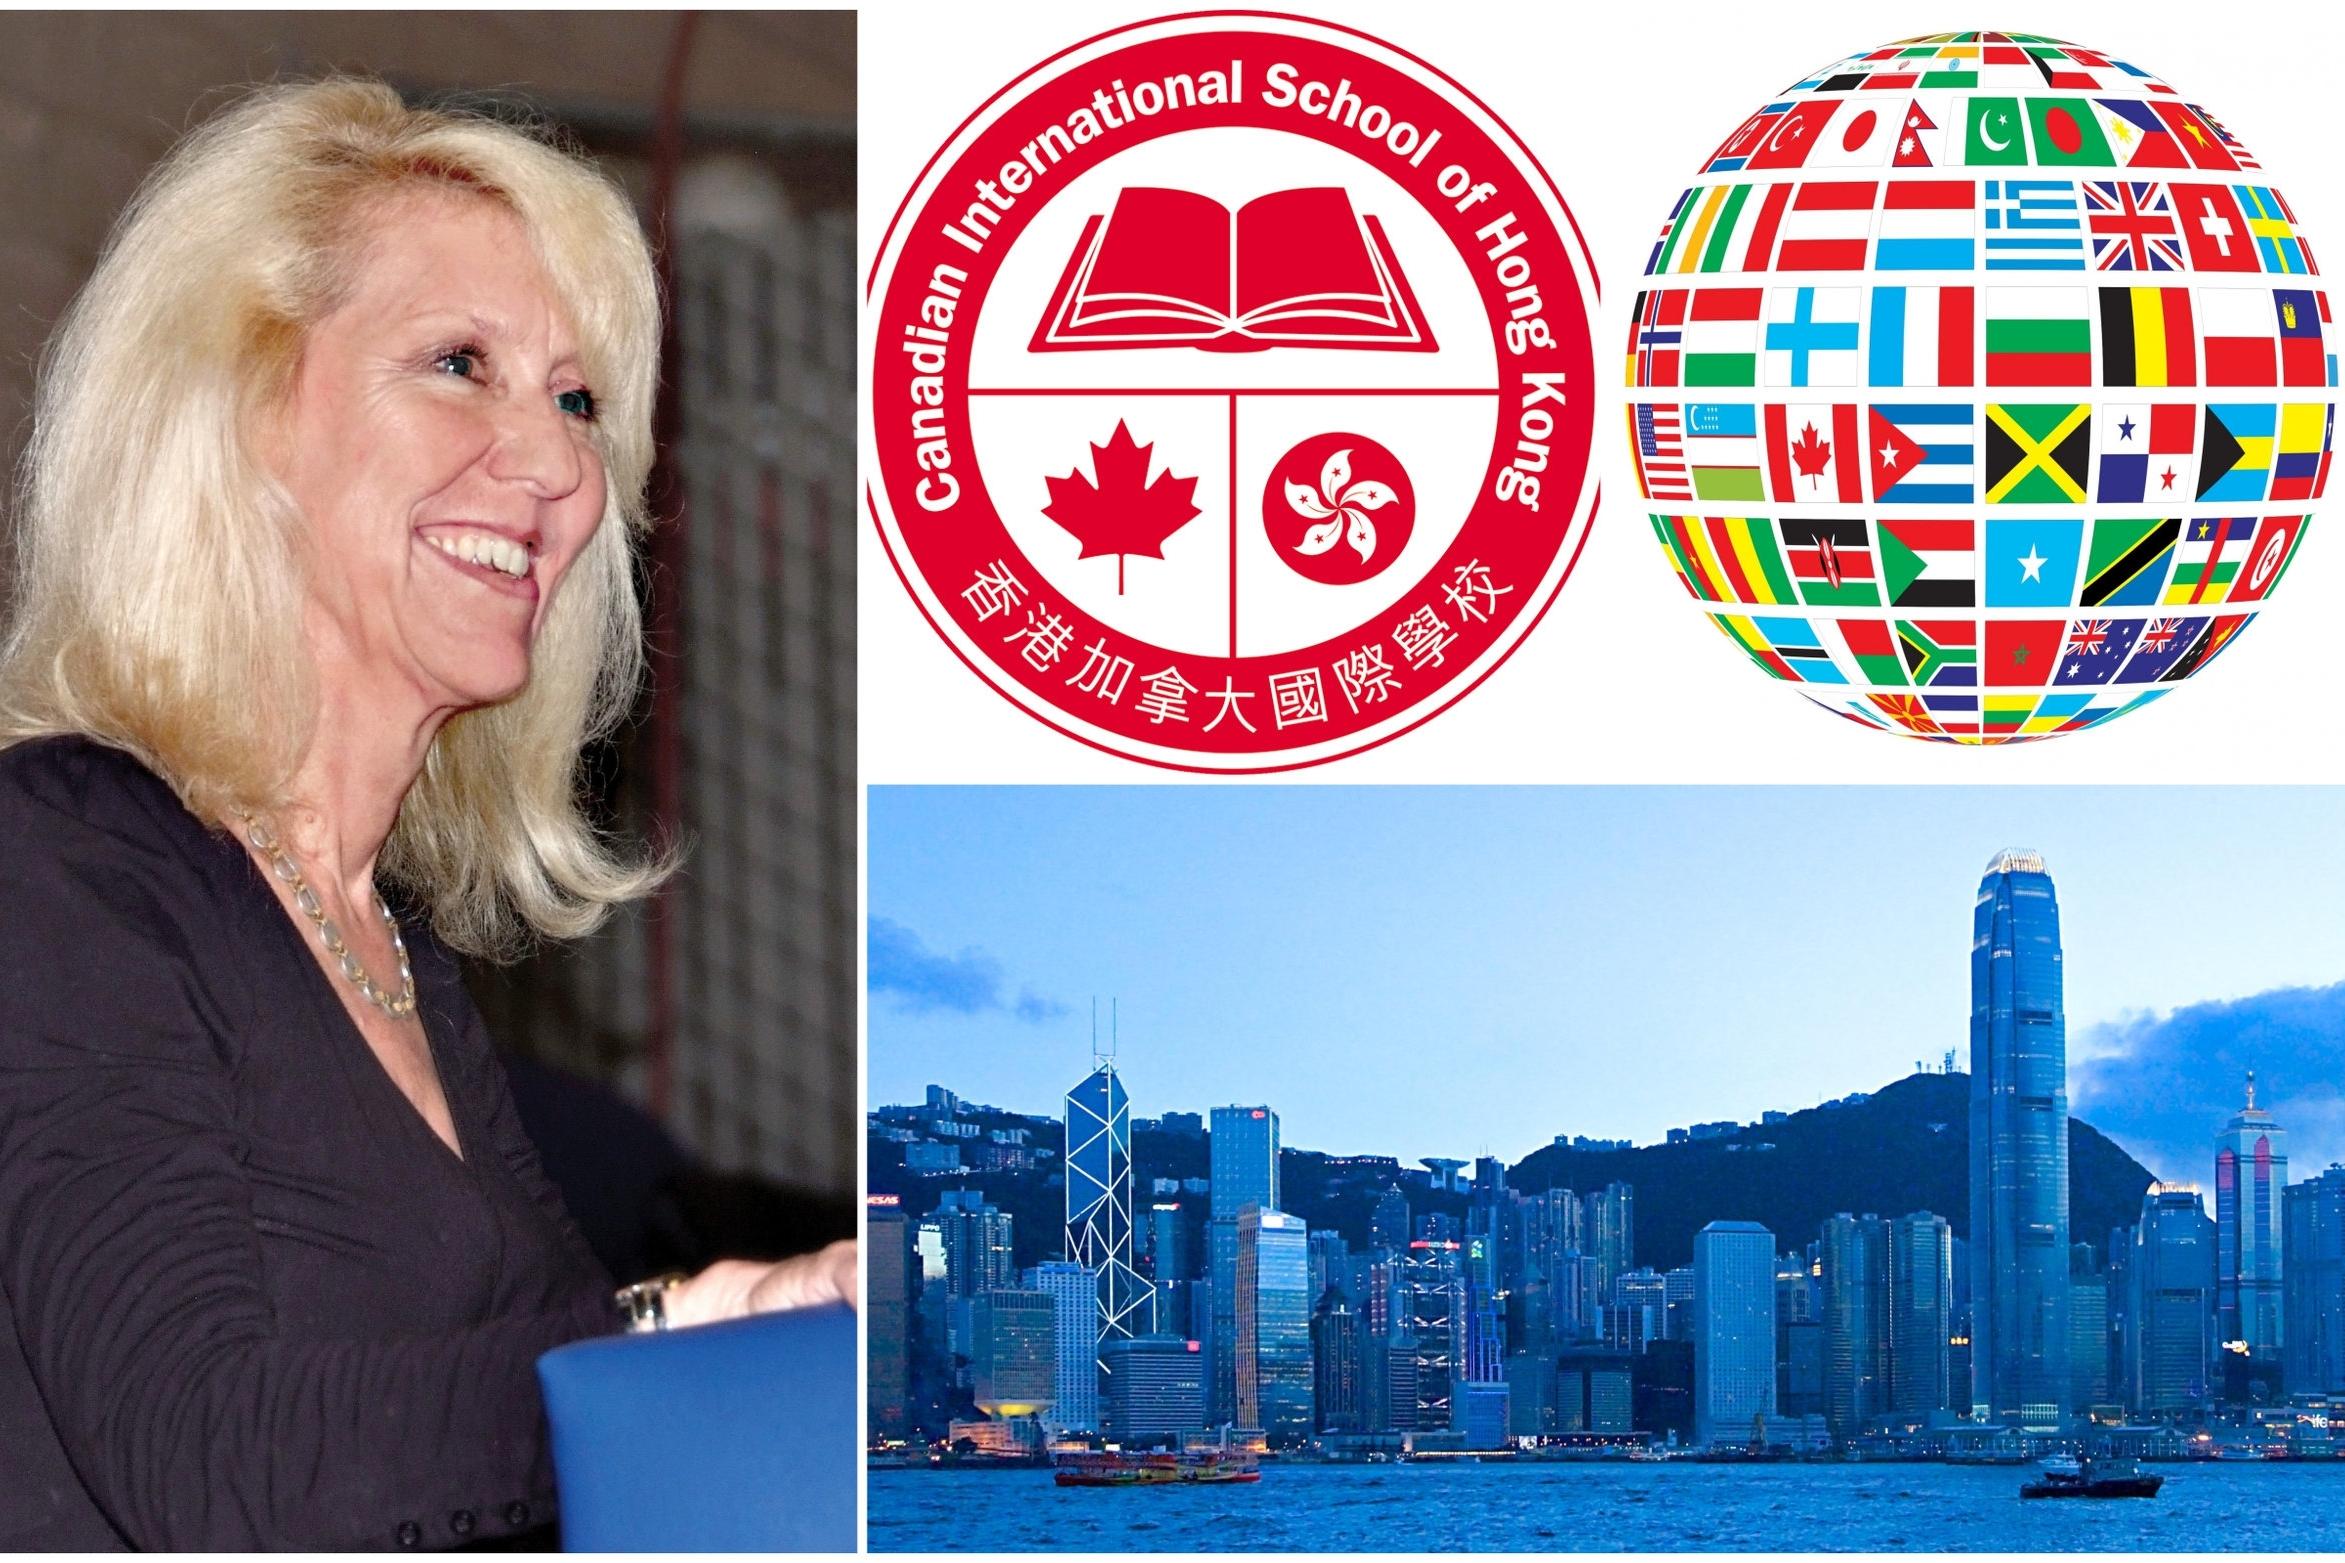 jane camblin Canadian Intl School Hong Kong.jpg